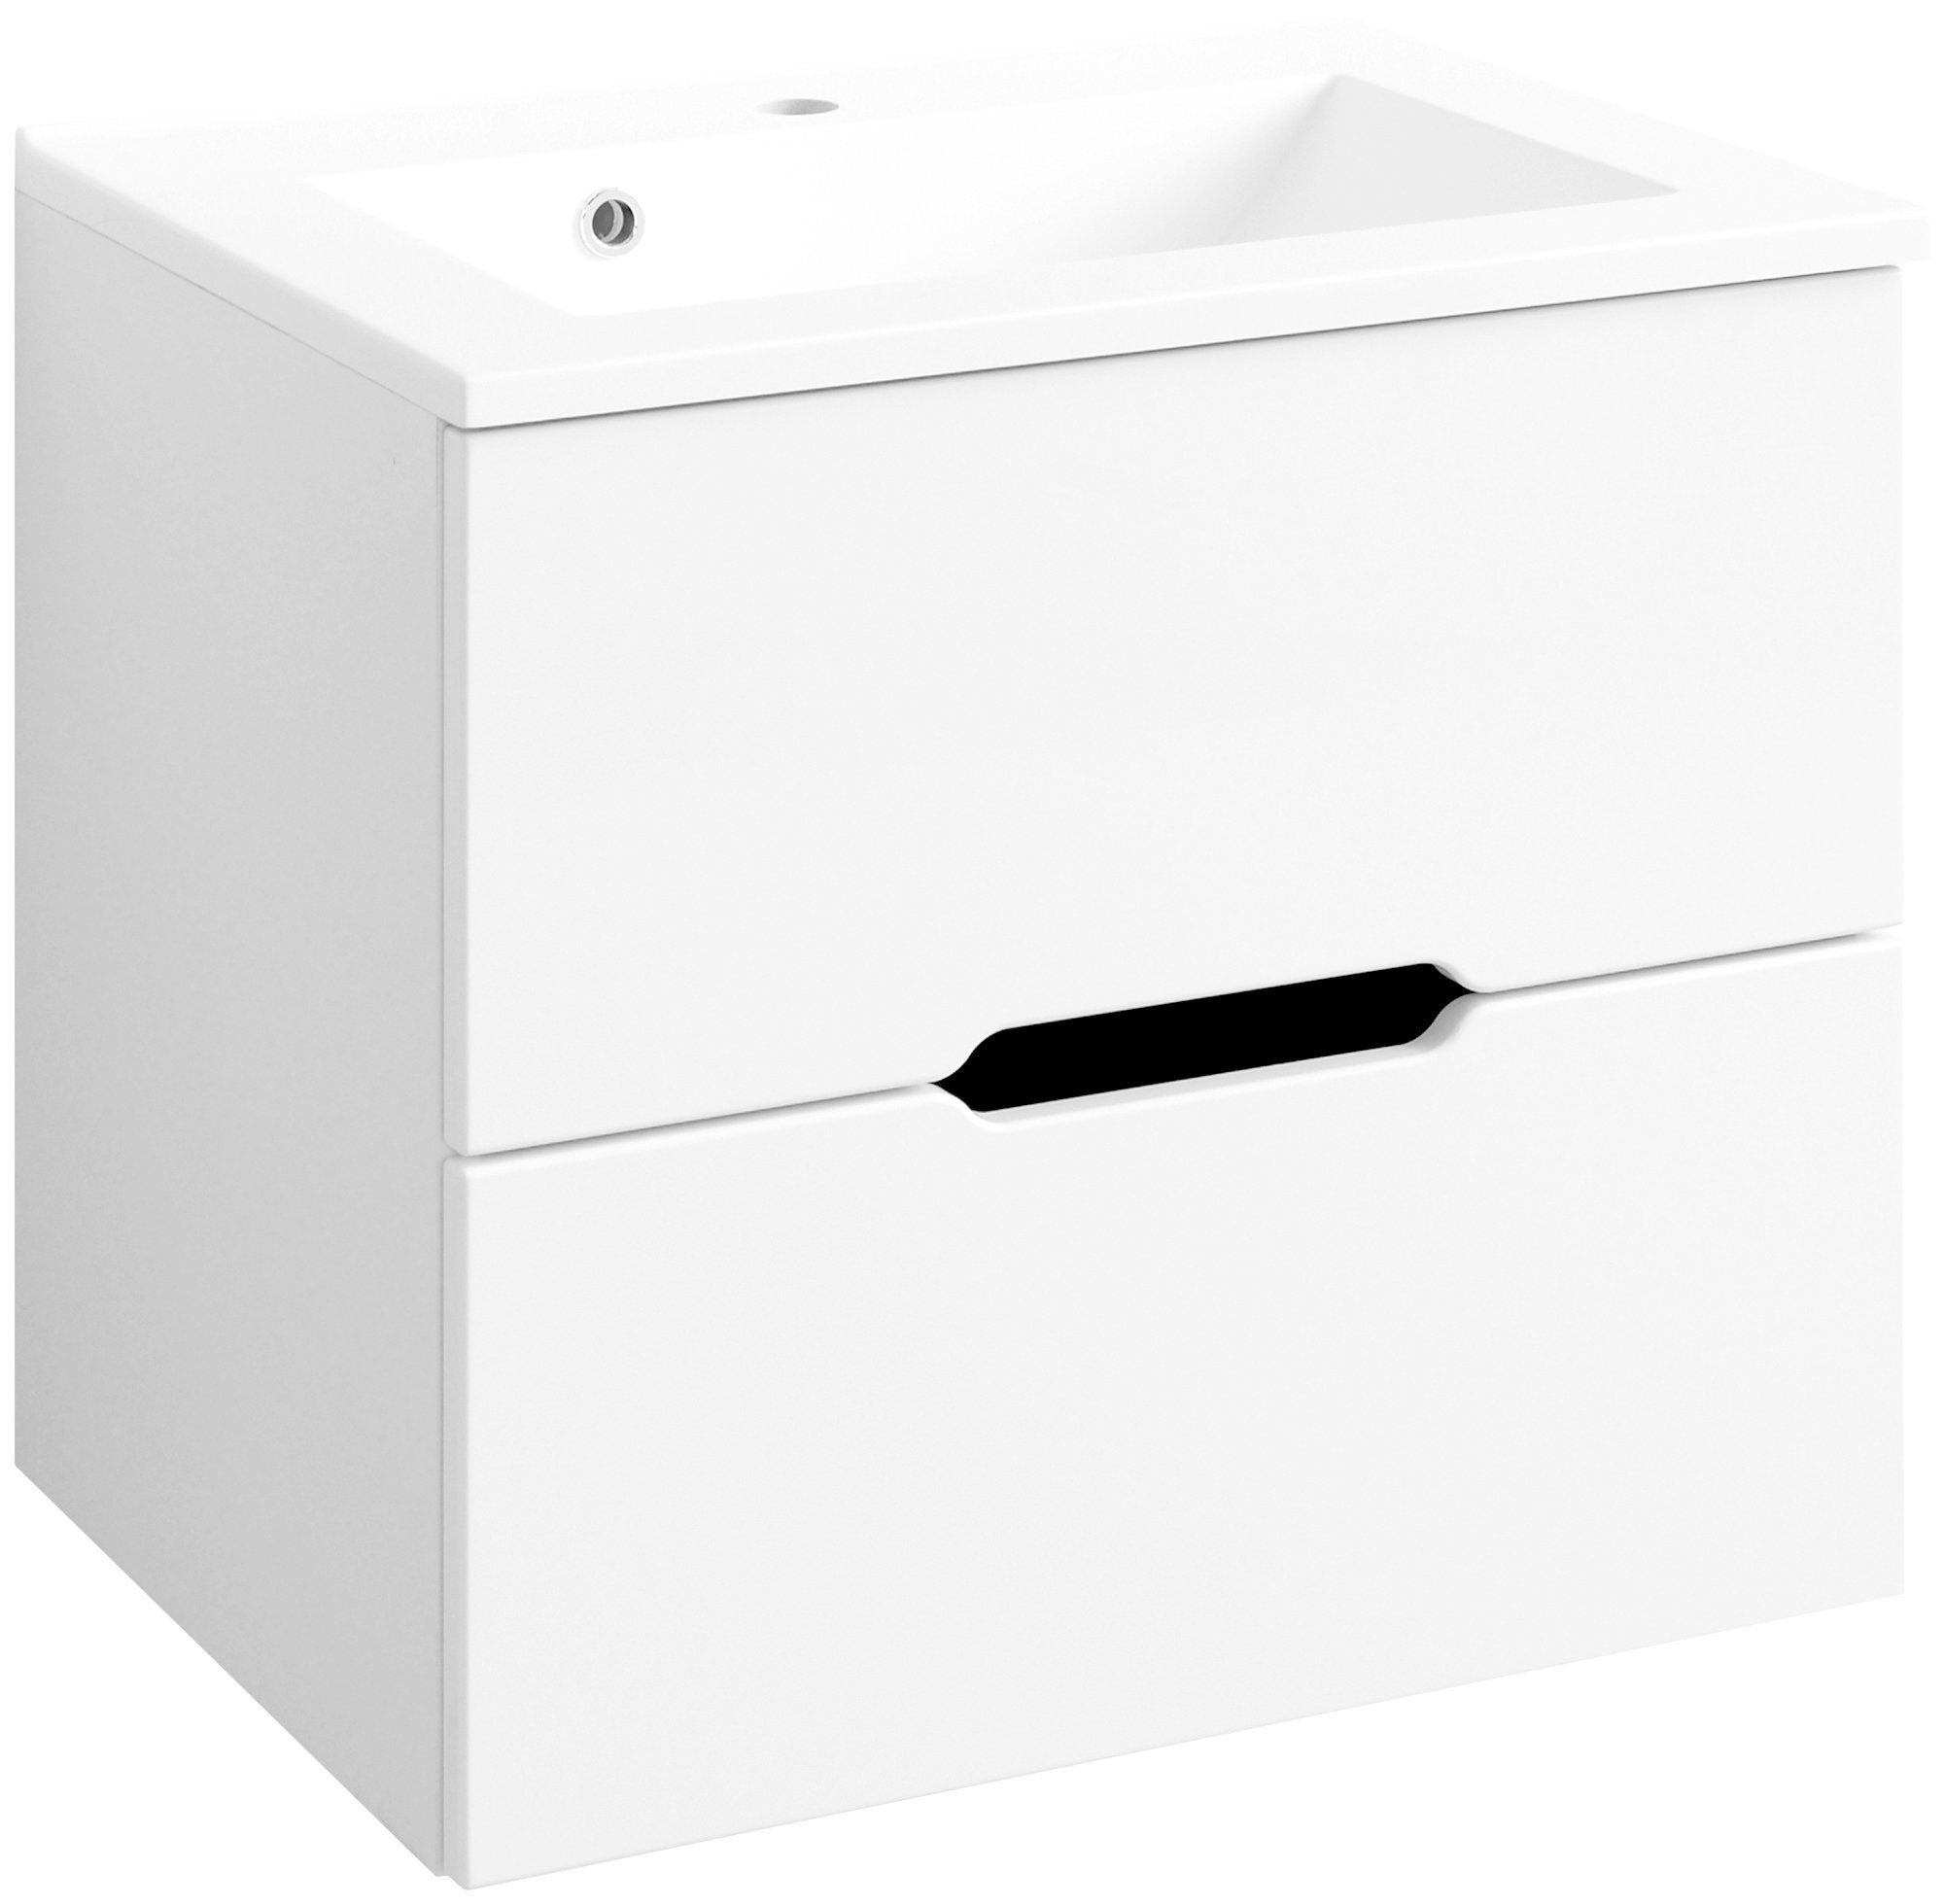 HELD MÖBEL Waschtisch »Belluno «, Breite 60 cm, (2-tlg.)